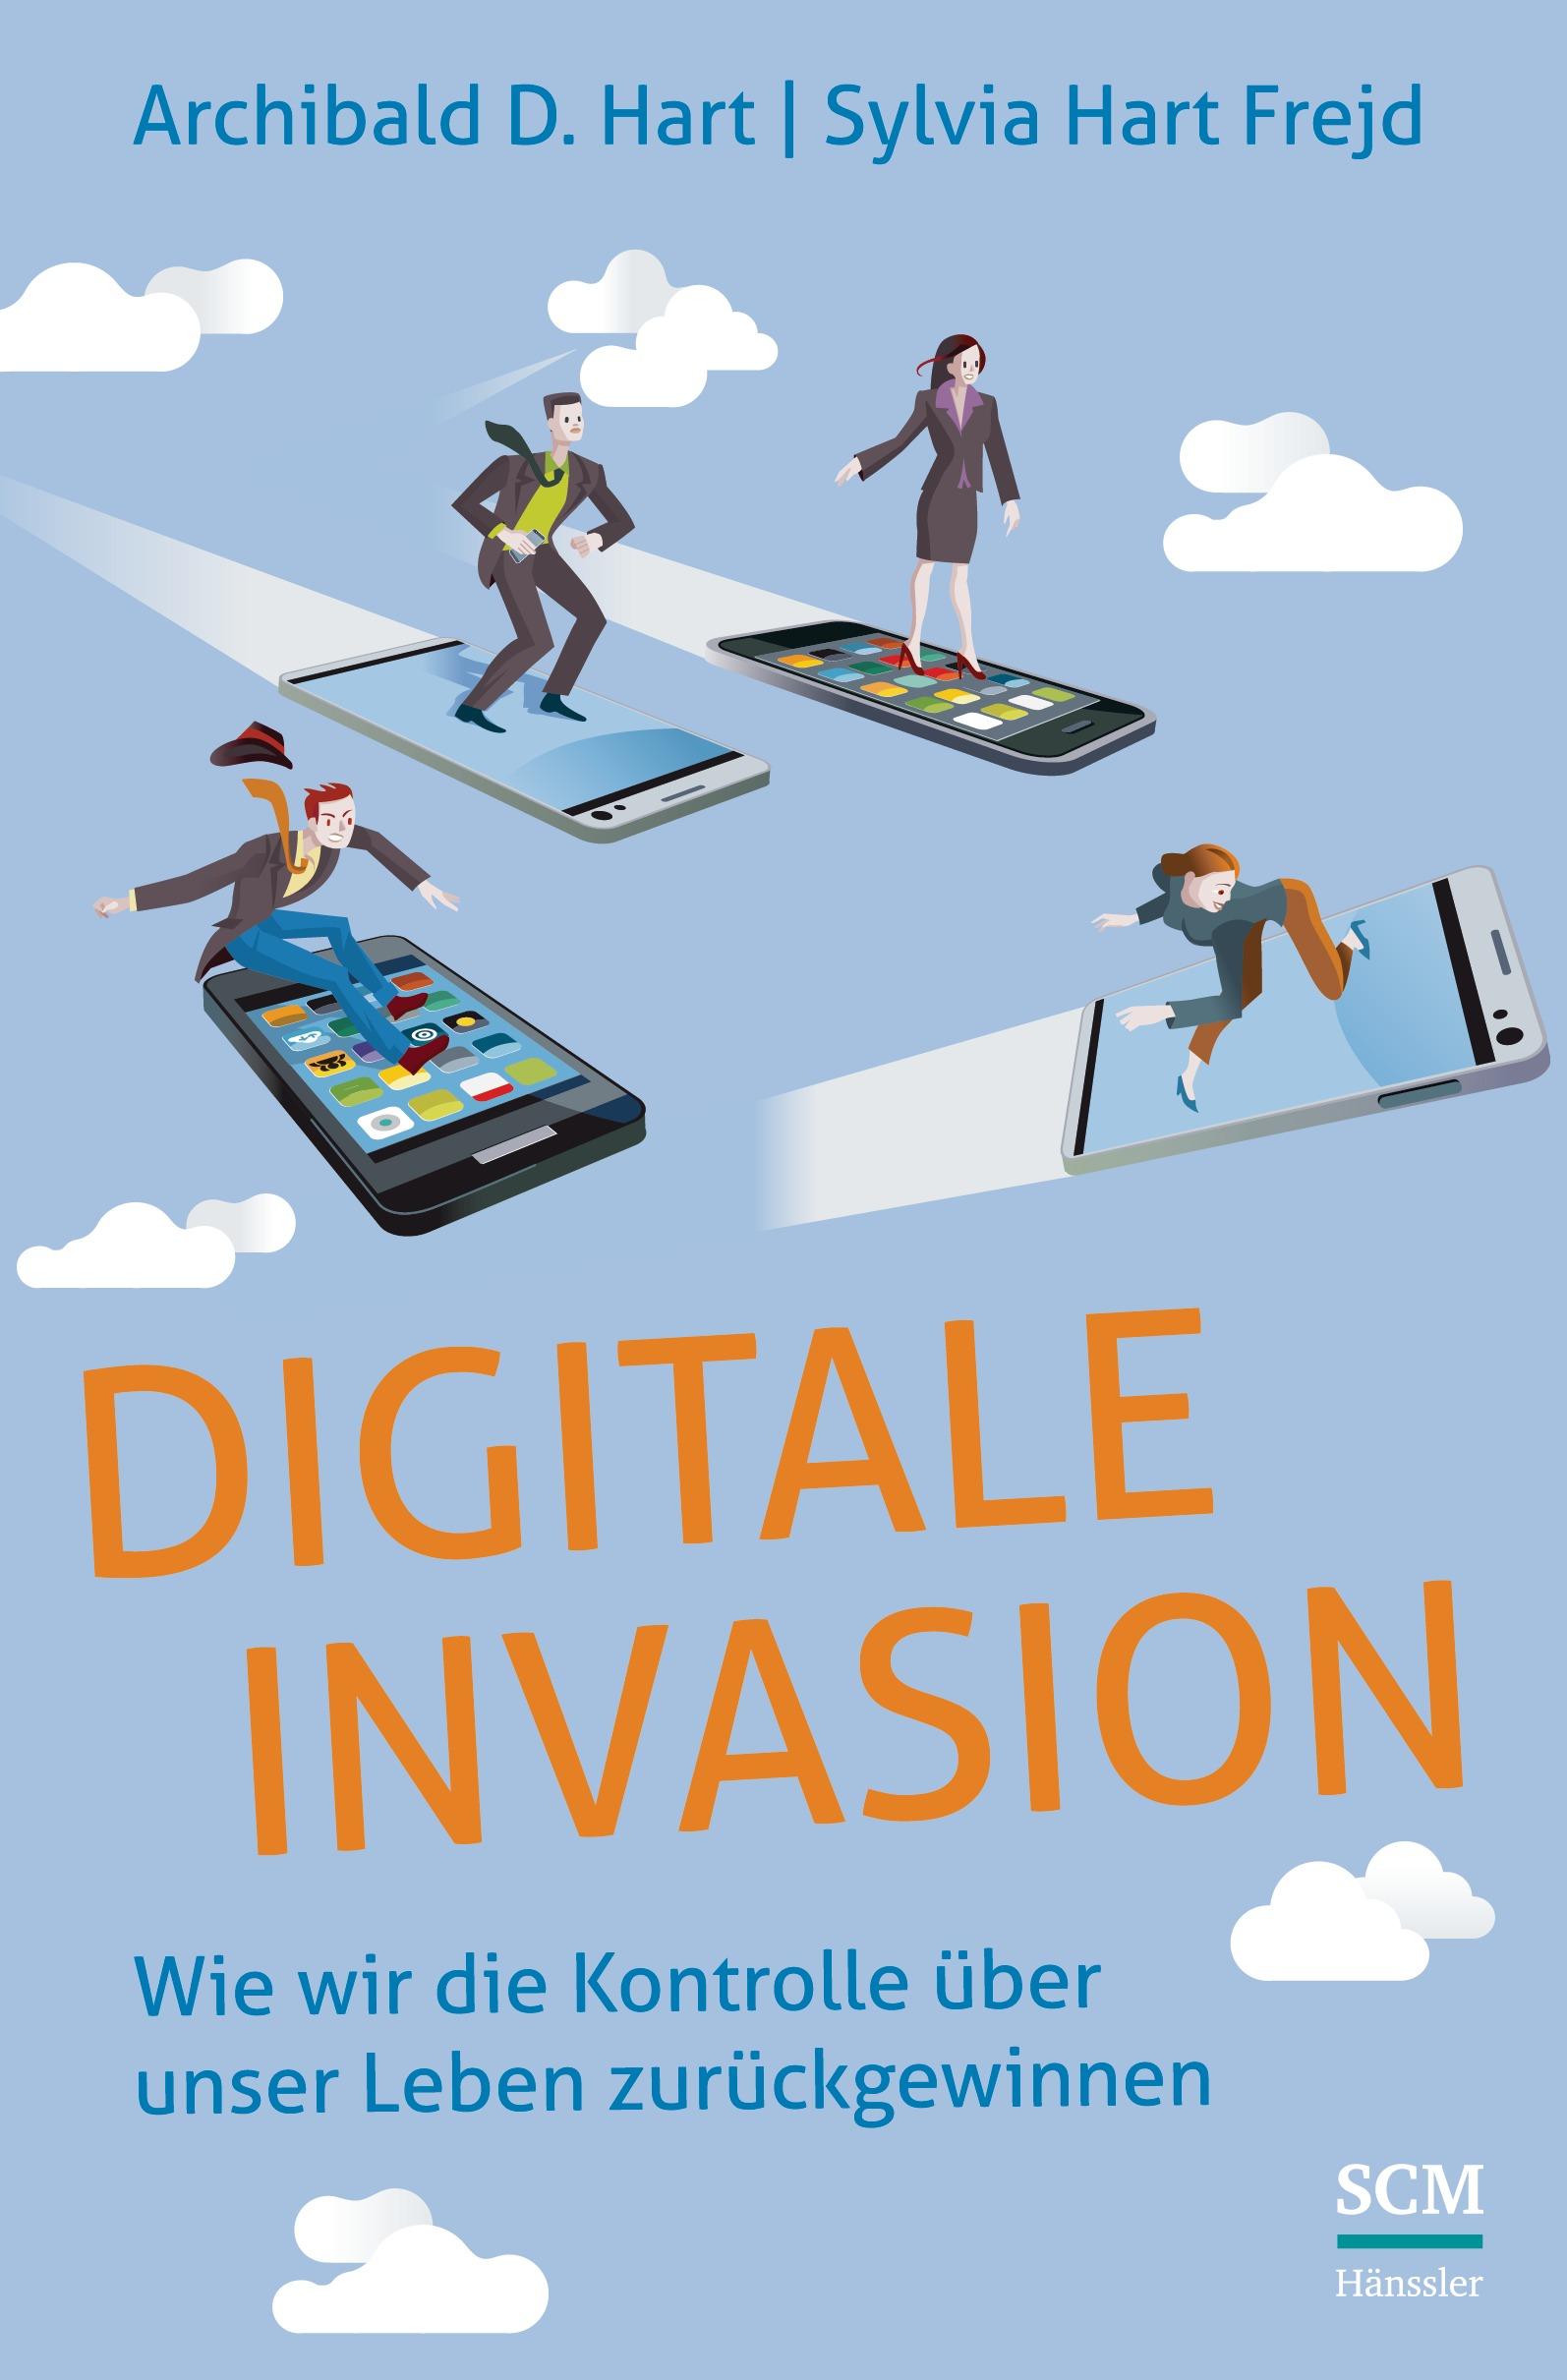 NEU Digitale Invasion Sylvia Hart Frejd 155427